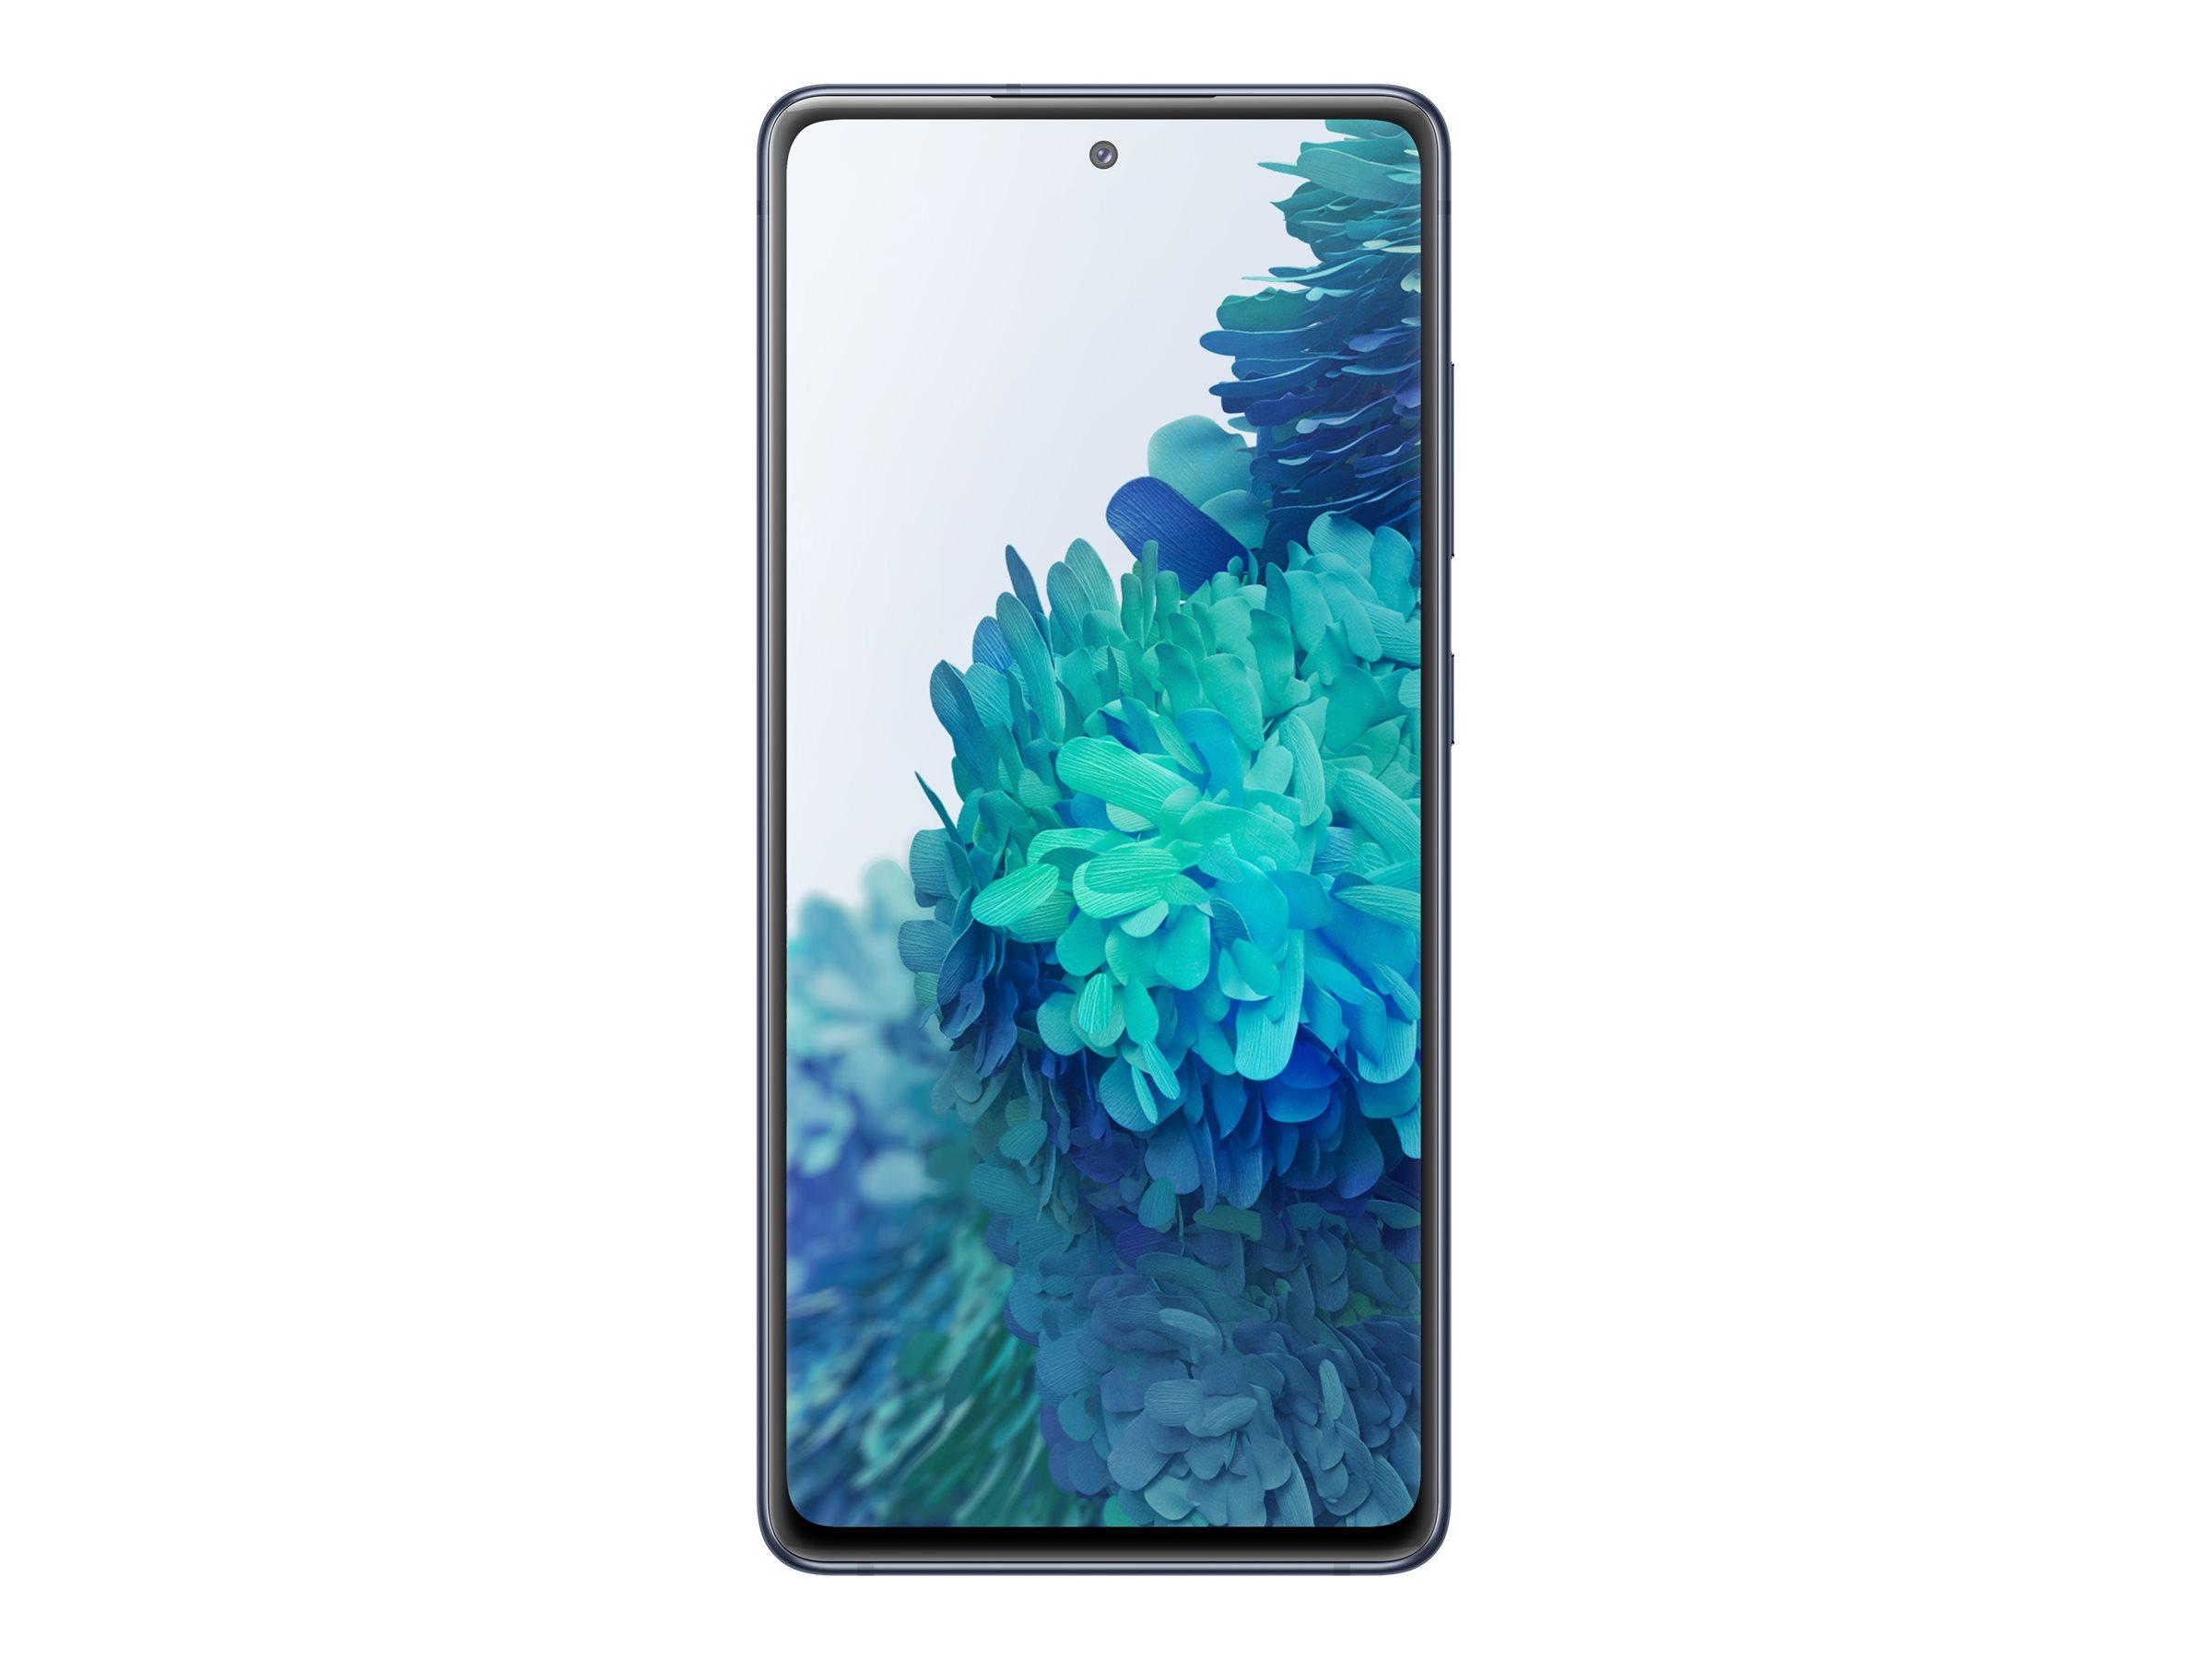 "Samsung Galaxy S20 FE 5G - Smartphone - Dual-SIM - 5G NR - 128 GB - microSD slot - GSM - 6.5"" - Cloud Navy"